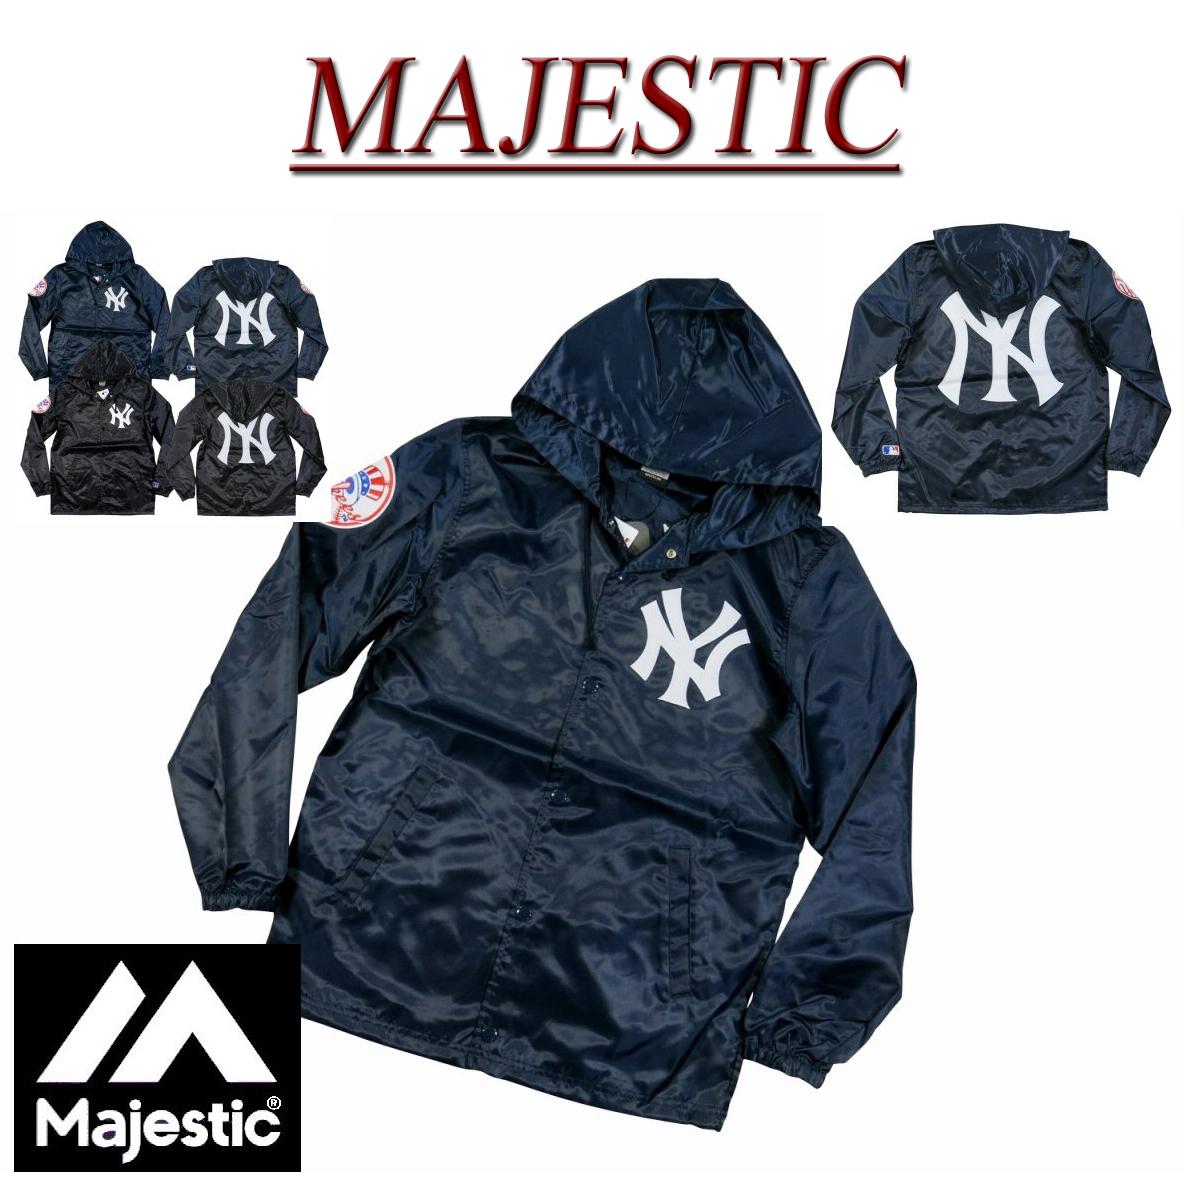 aea153c6b J Rakuten Ichiba shop Plus: ja871 new MAJESTIC New York Yankees hooded  satin coach jacket men's majestic New York Yankees MLB OFFICIAL WEAR NY  windbreaker ...